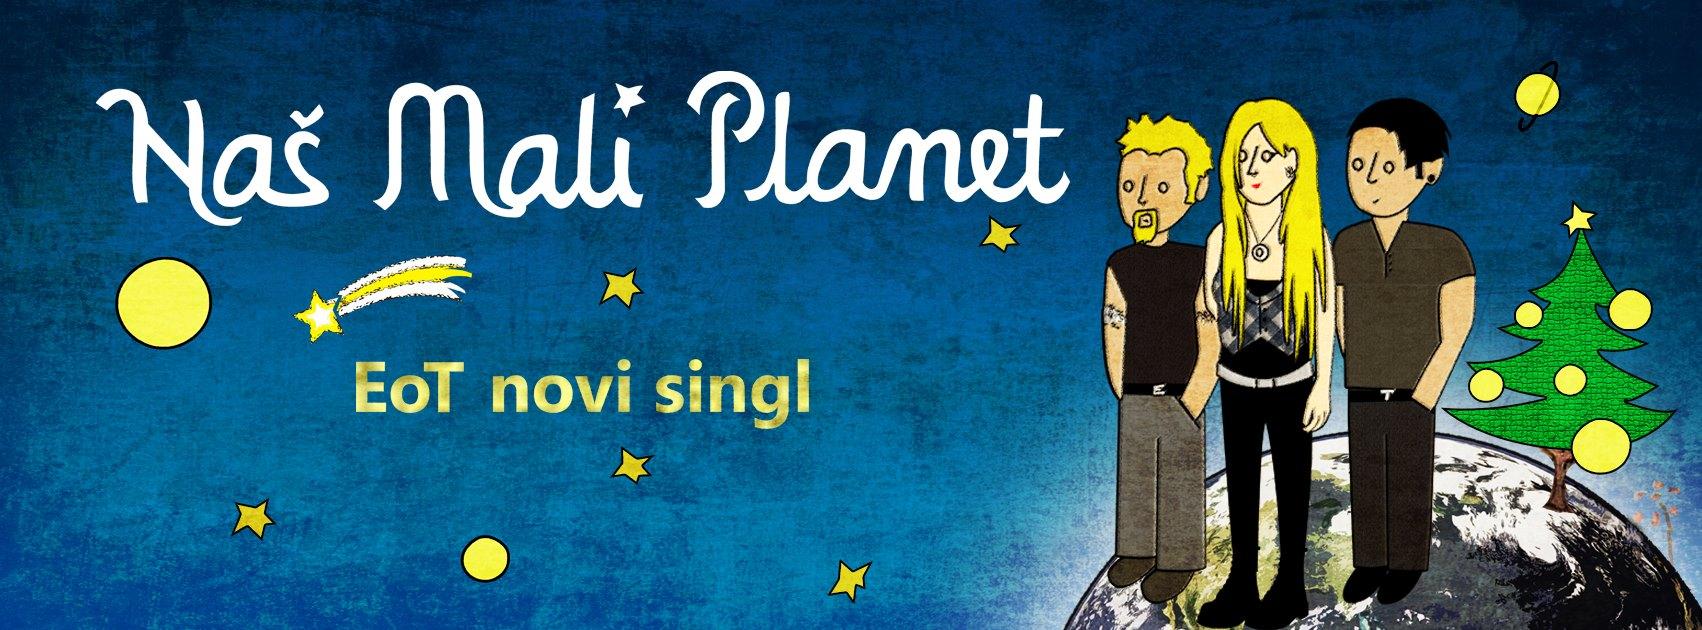 Božićni videospot: EoT - Naš mali planet